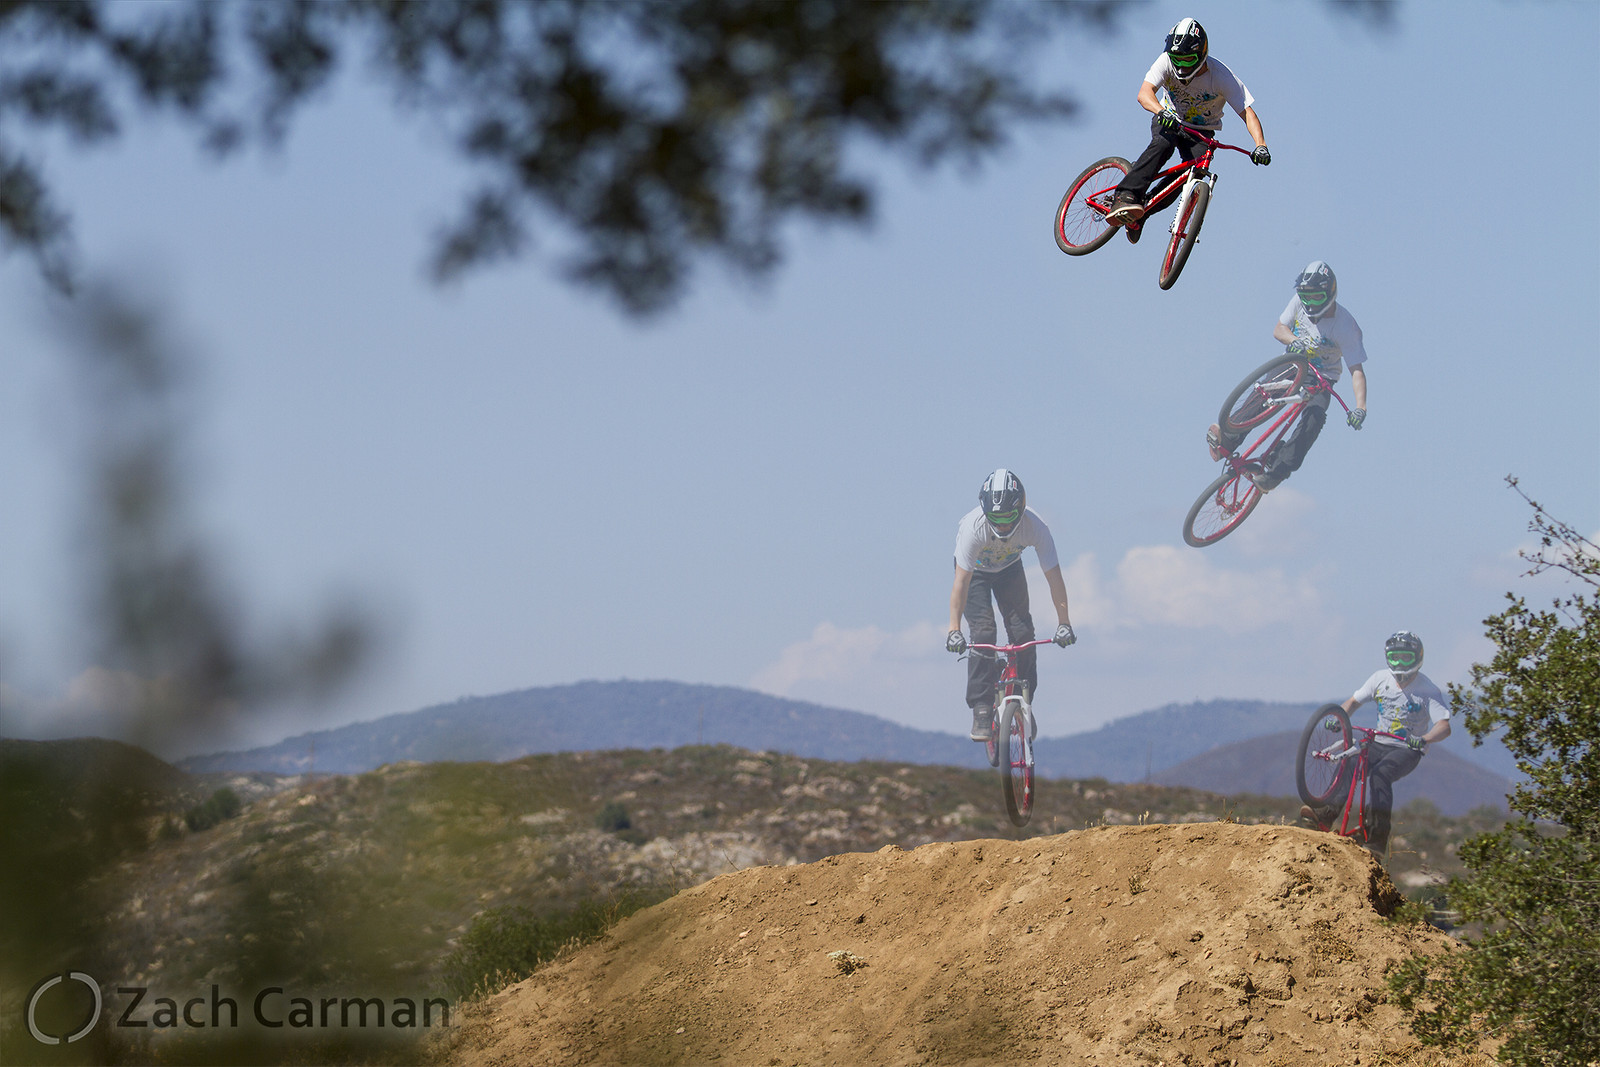 James Visser warming up - Captures by Carman - Mountain Biking Pictures - Vital MTB